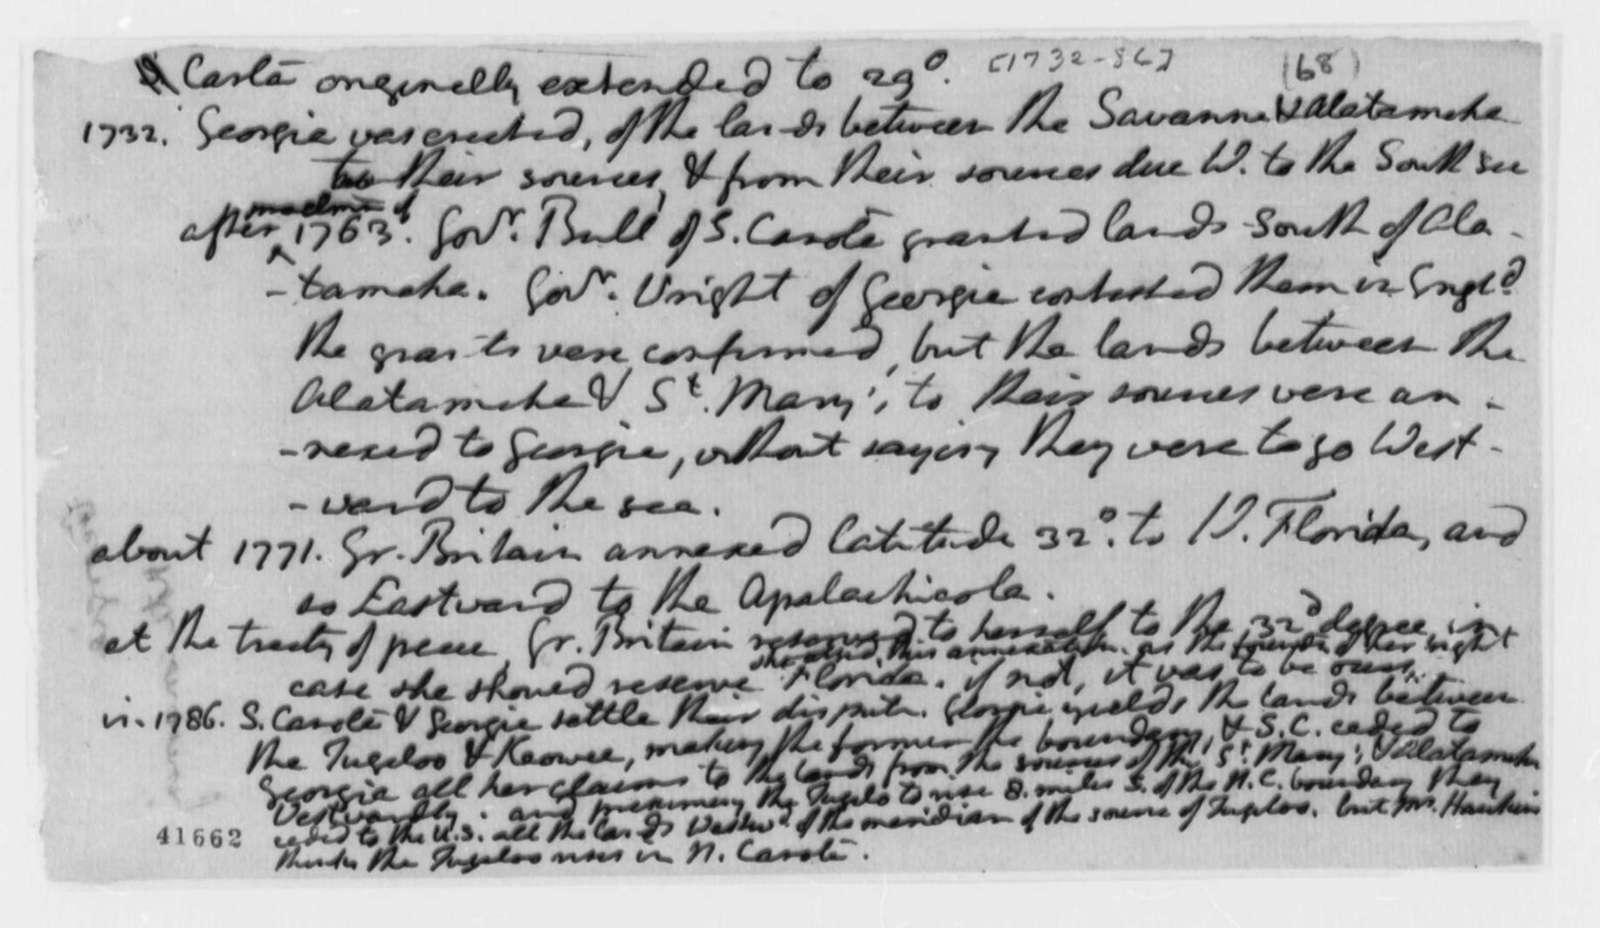 Thomas Jefferson, 1732-86, Notes on Georgia History and Boundaries